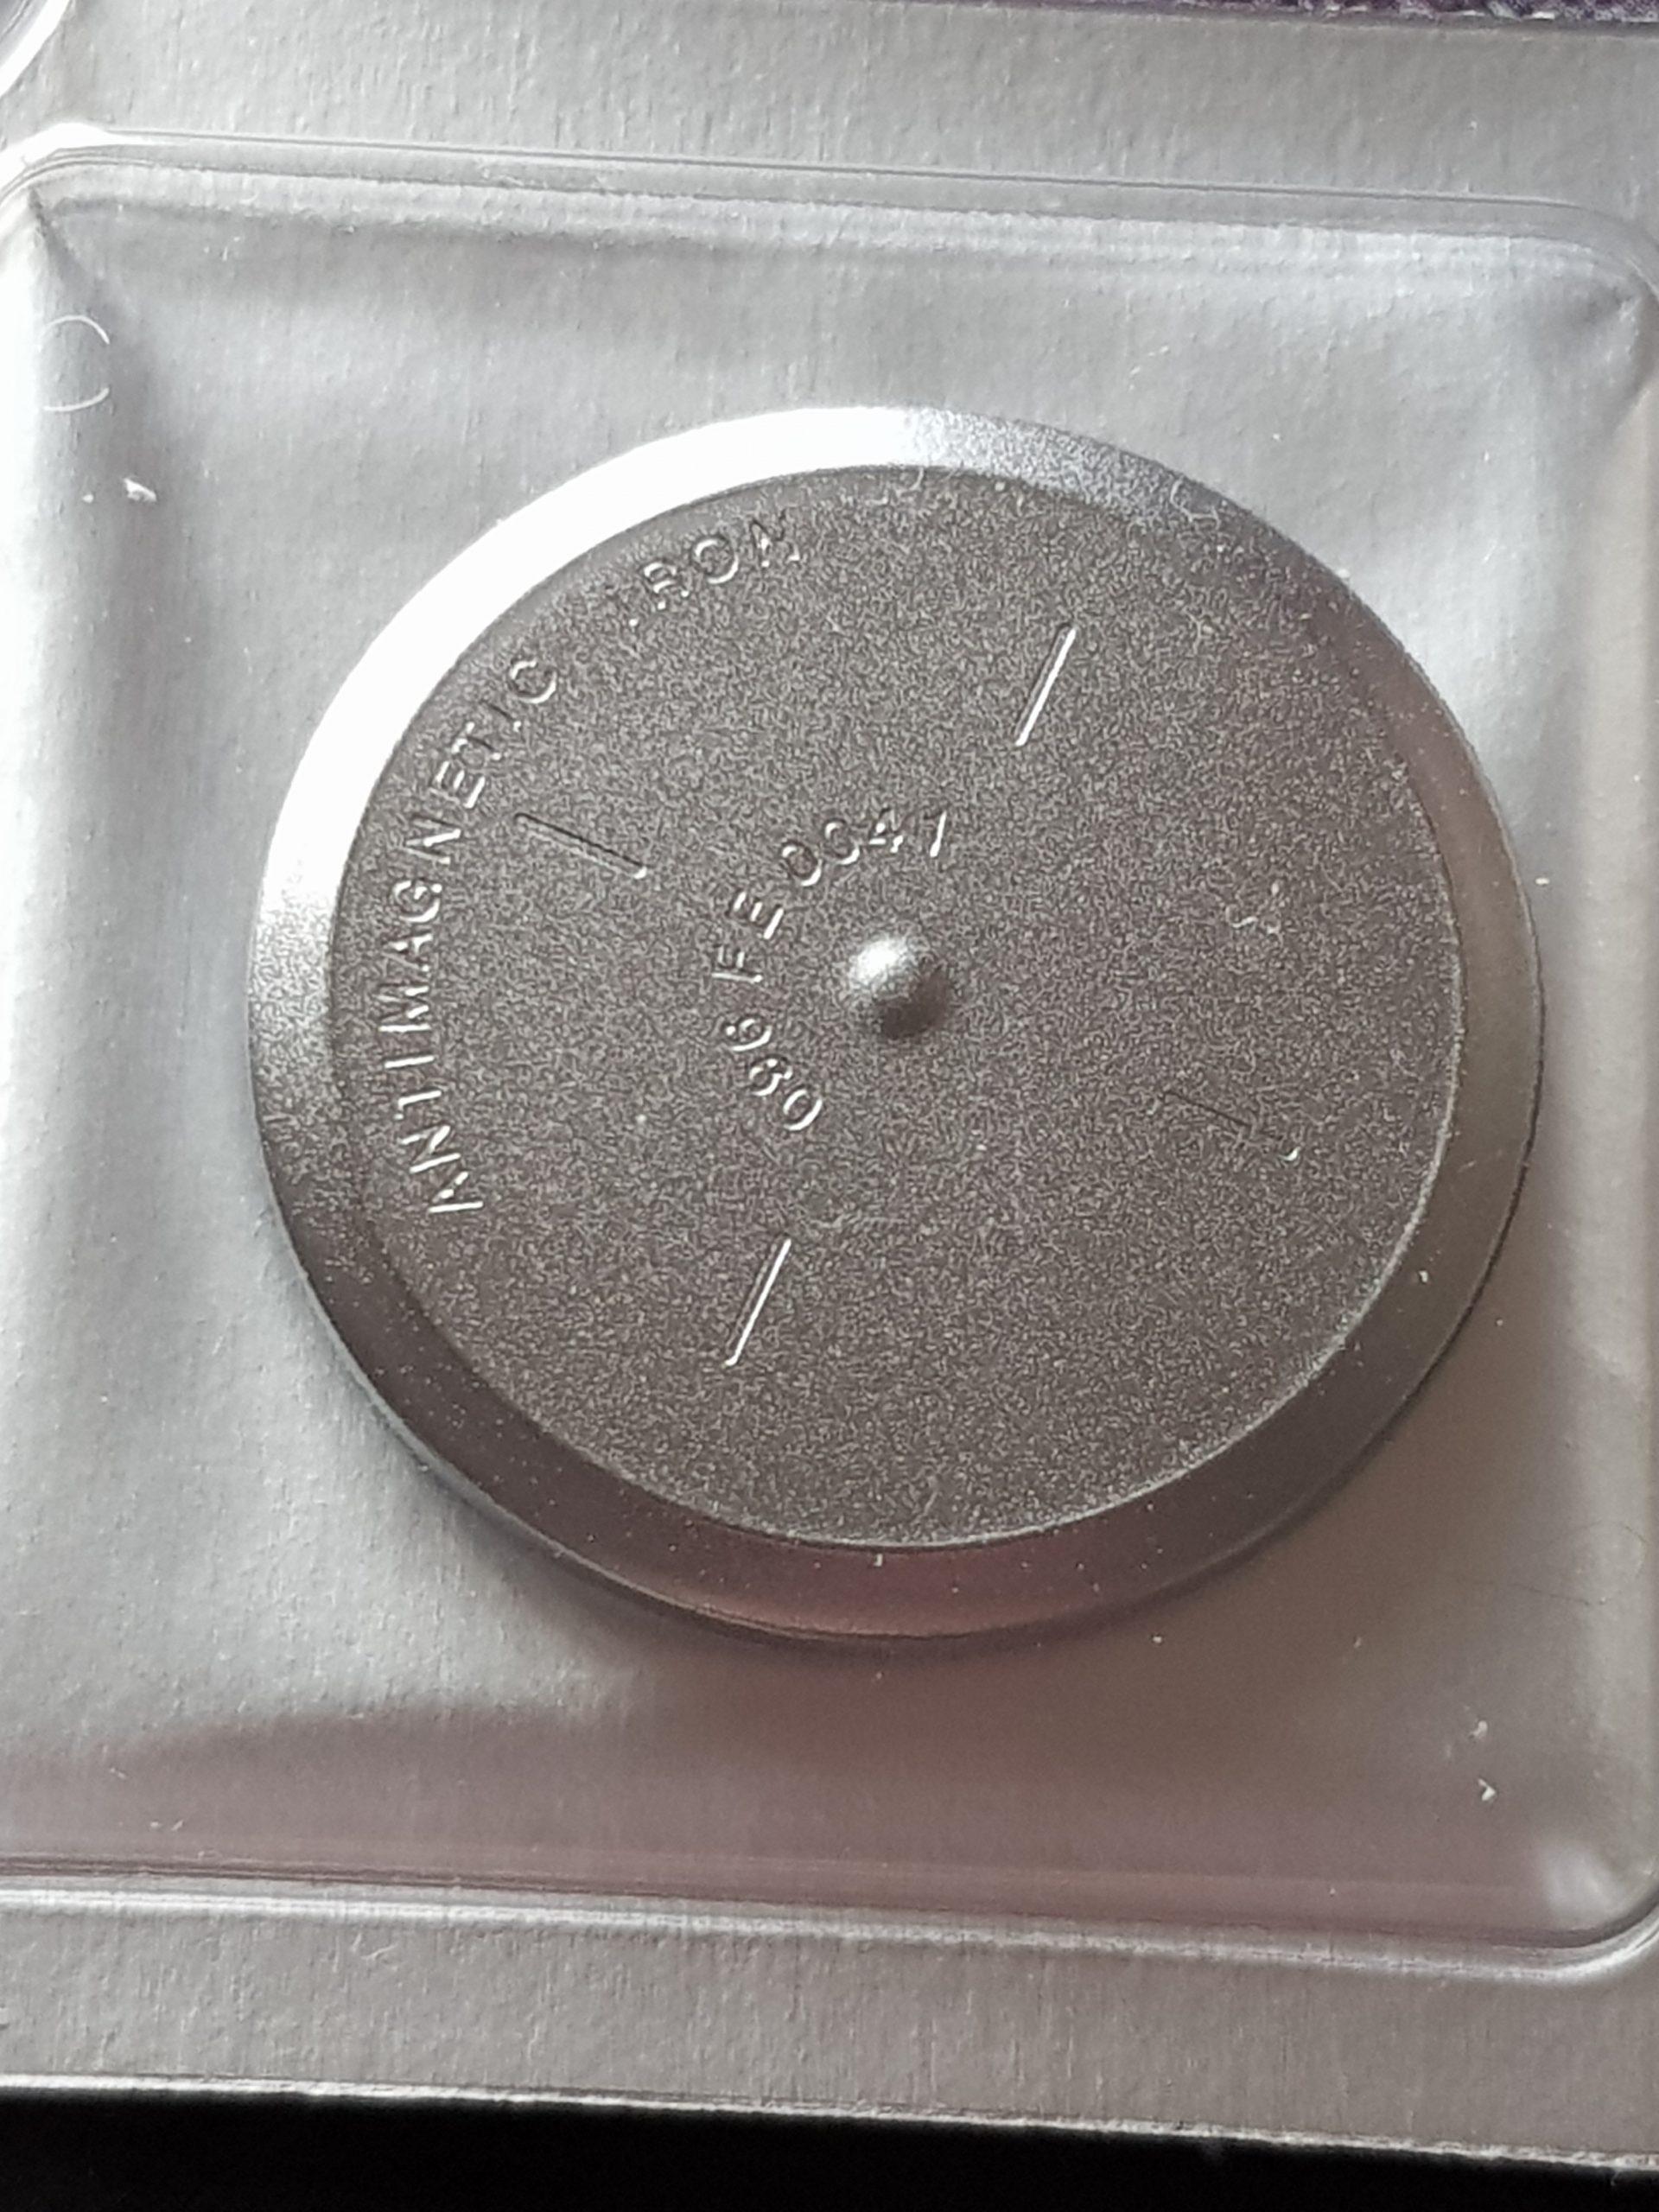 096FE0041 Genuine Omega Anti-Magnetic Dust Cover